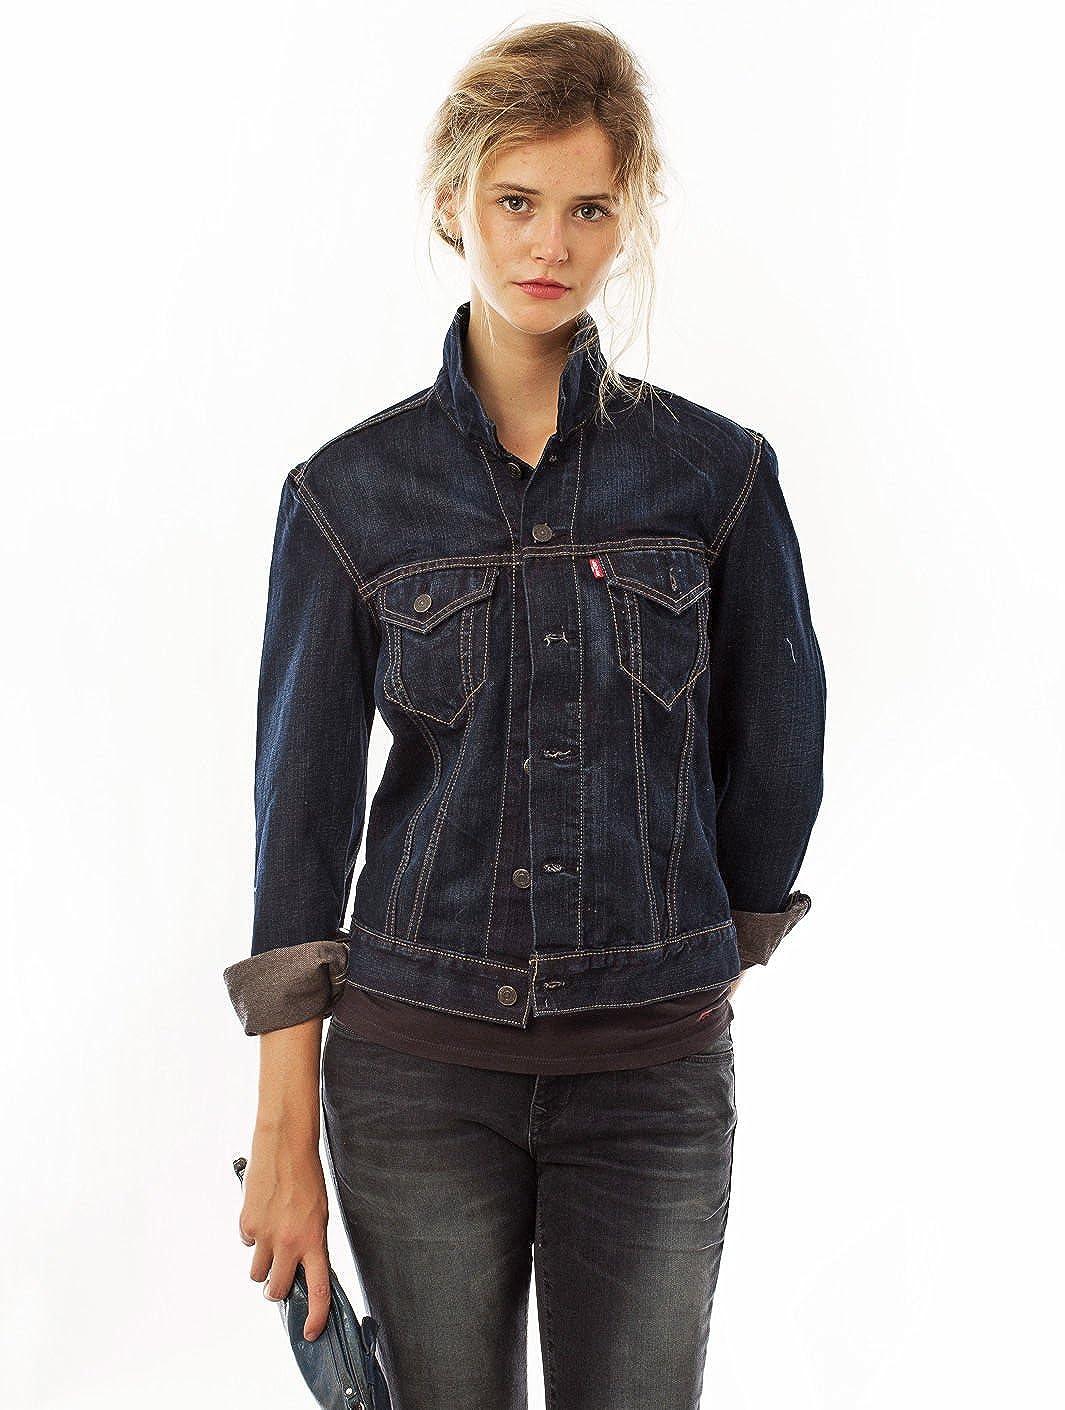 LEVIS Slim Fit Trucjer Jacket Chaqueta Con Capucha Para Hombre Levis Jeans azul turquesa Talla:XL: Amazon.es: Deportes y aire libre